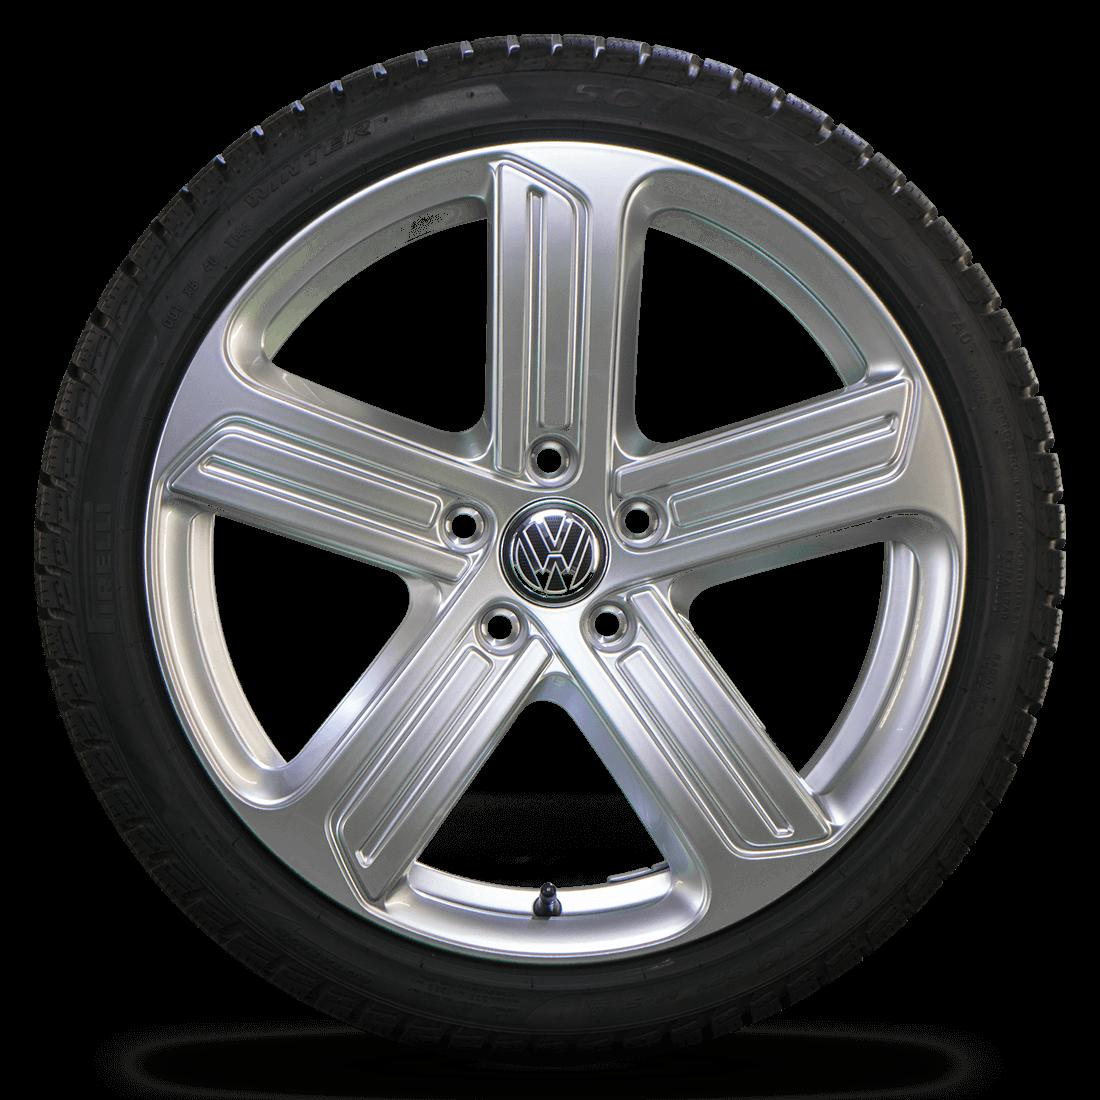 VW 18 Inch Rims Golf 7 6 GTI GTD Cadiz Alloy Wheels Winter Tires Winter Wheels